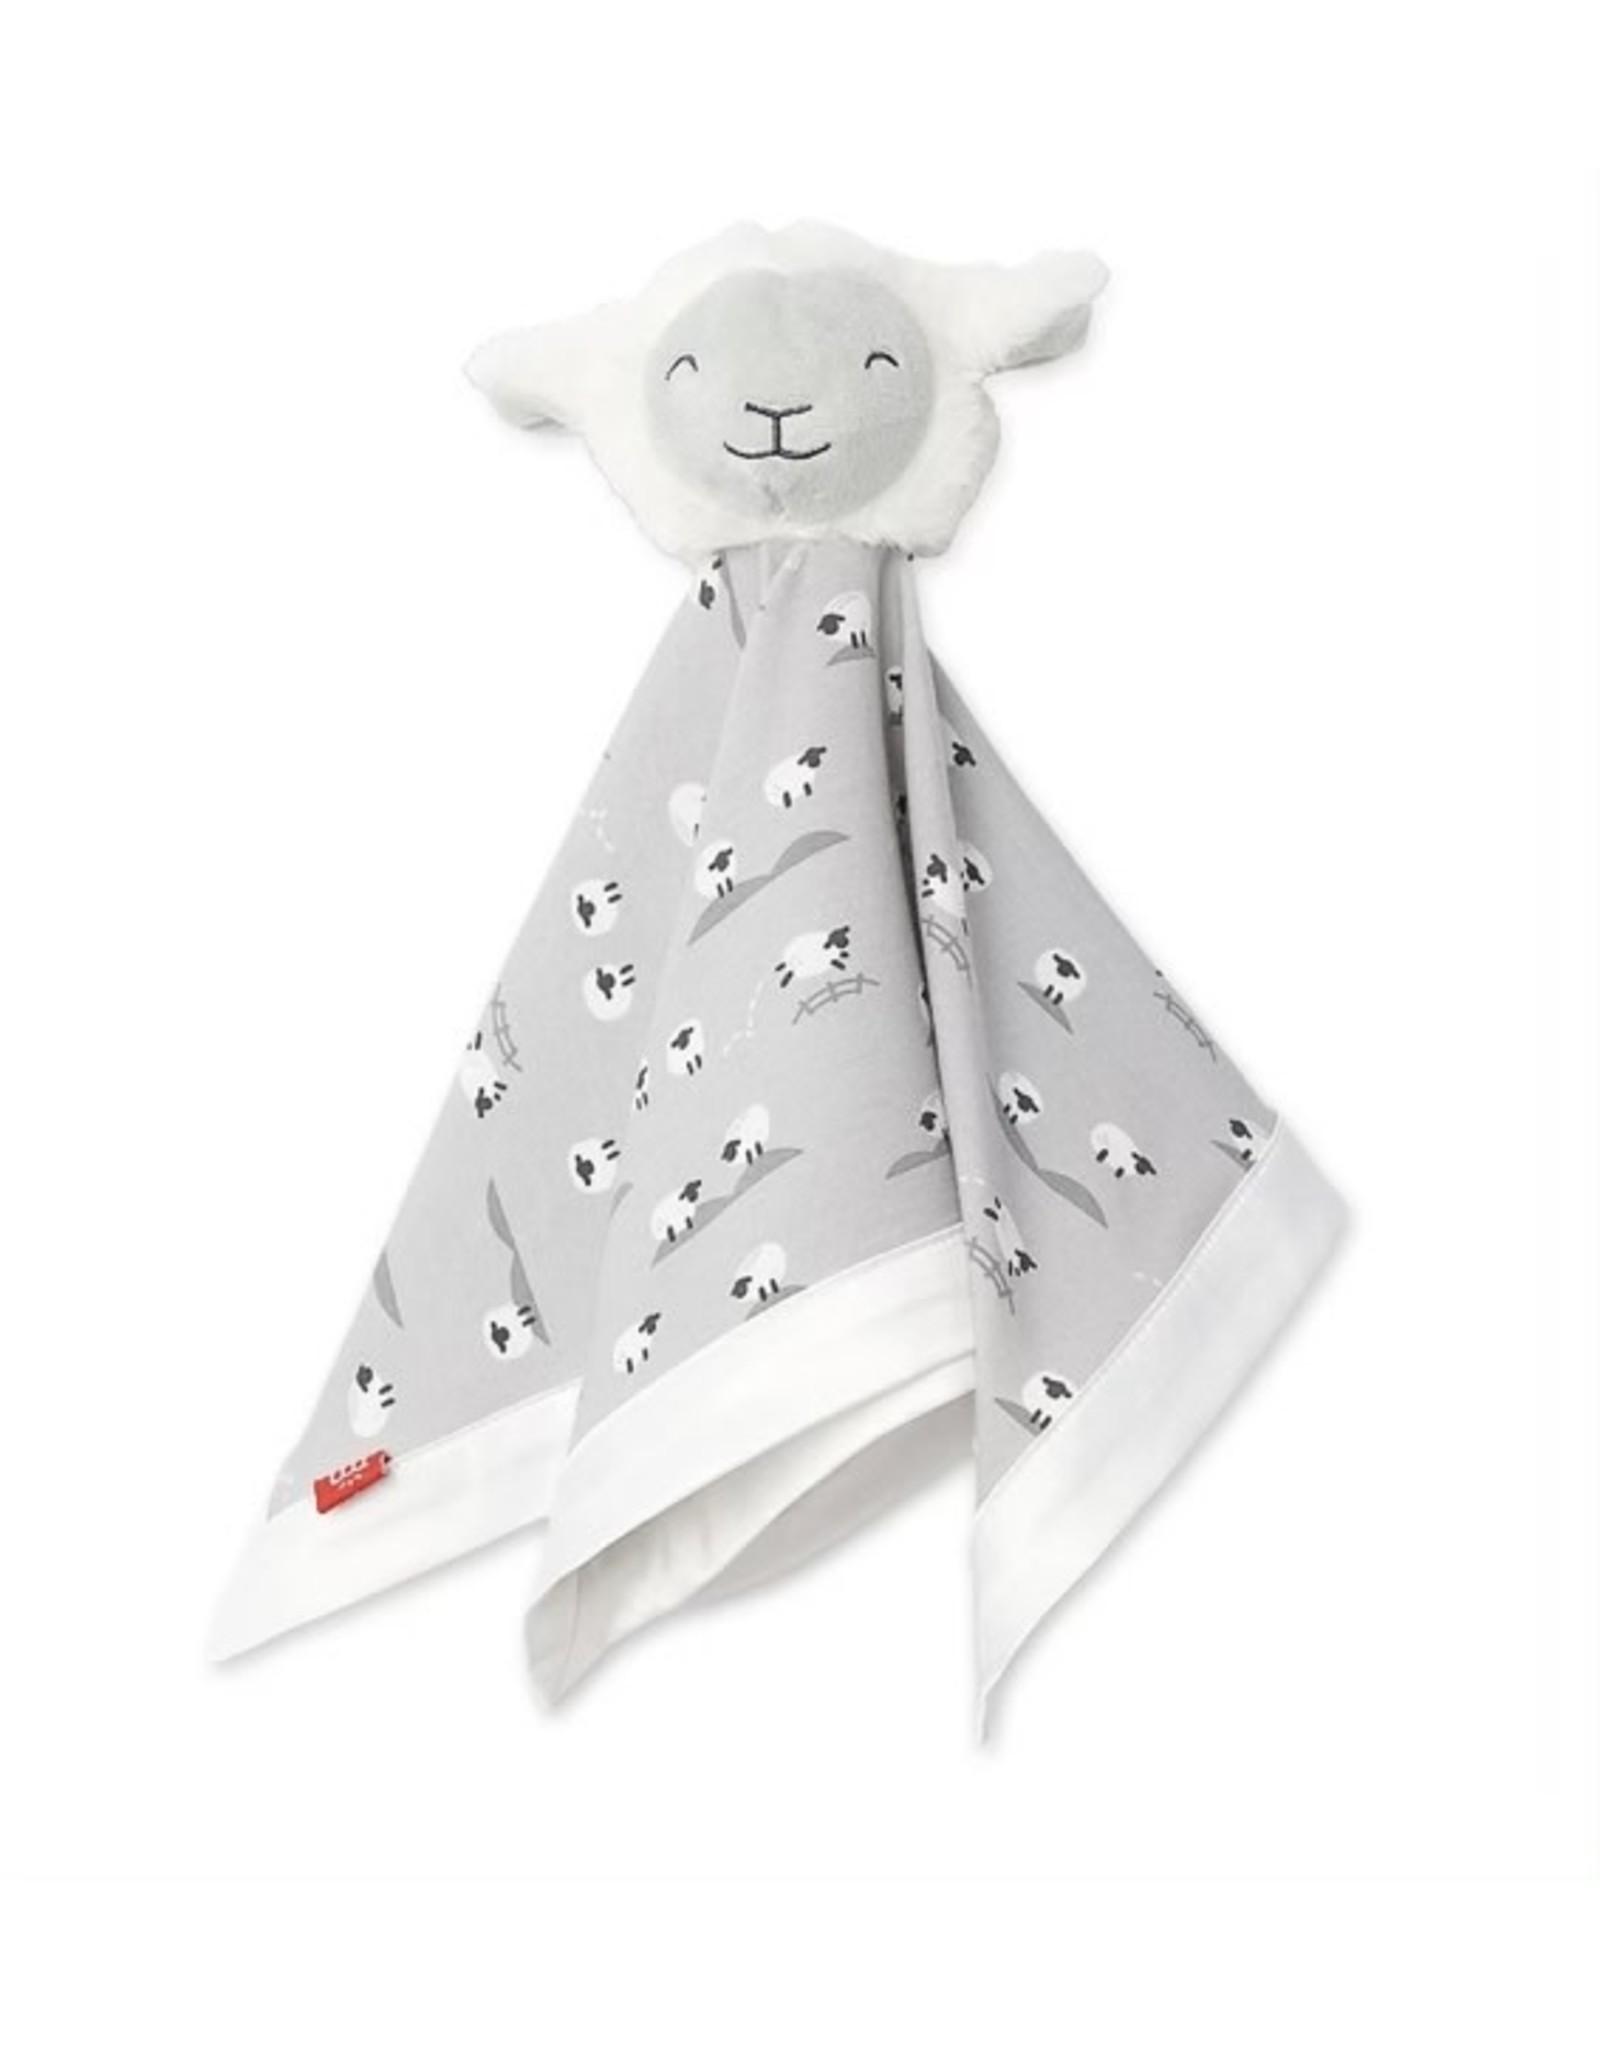 Magnetic Me Magnetic Me- Baa Baa Baby Gray Modal Lovey Blanket